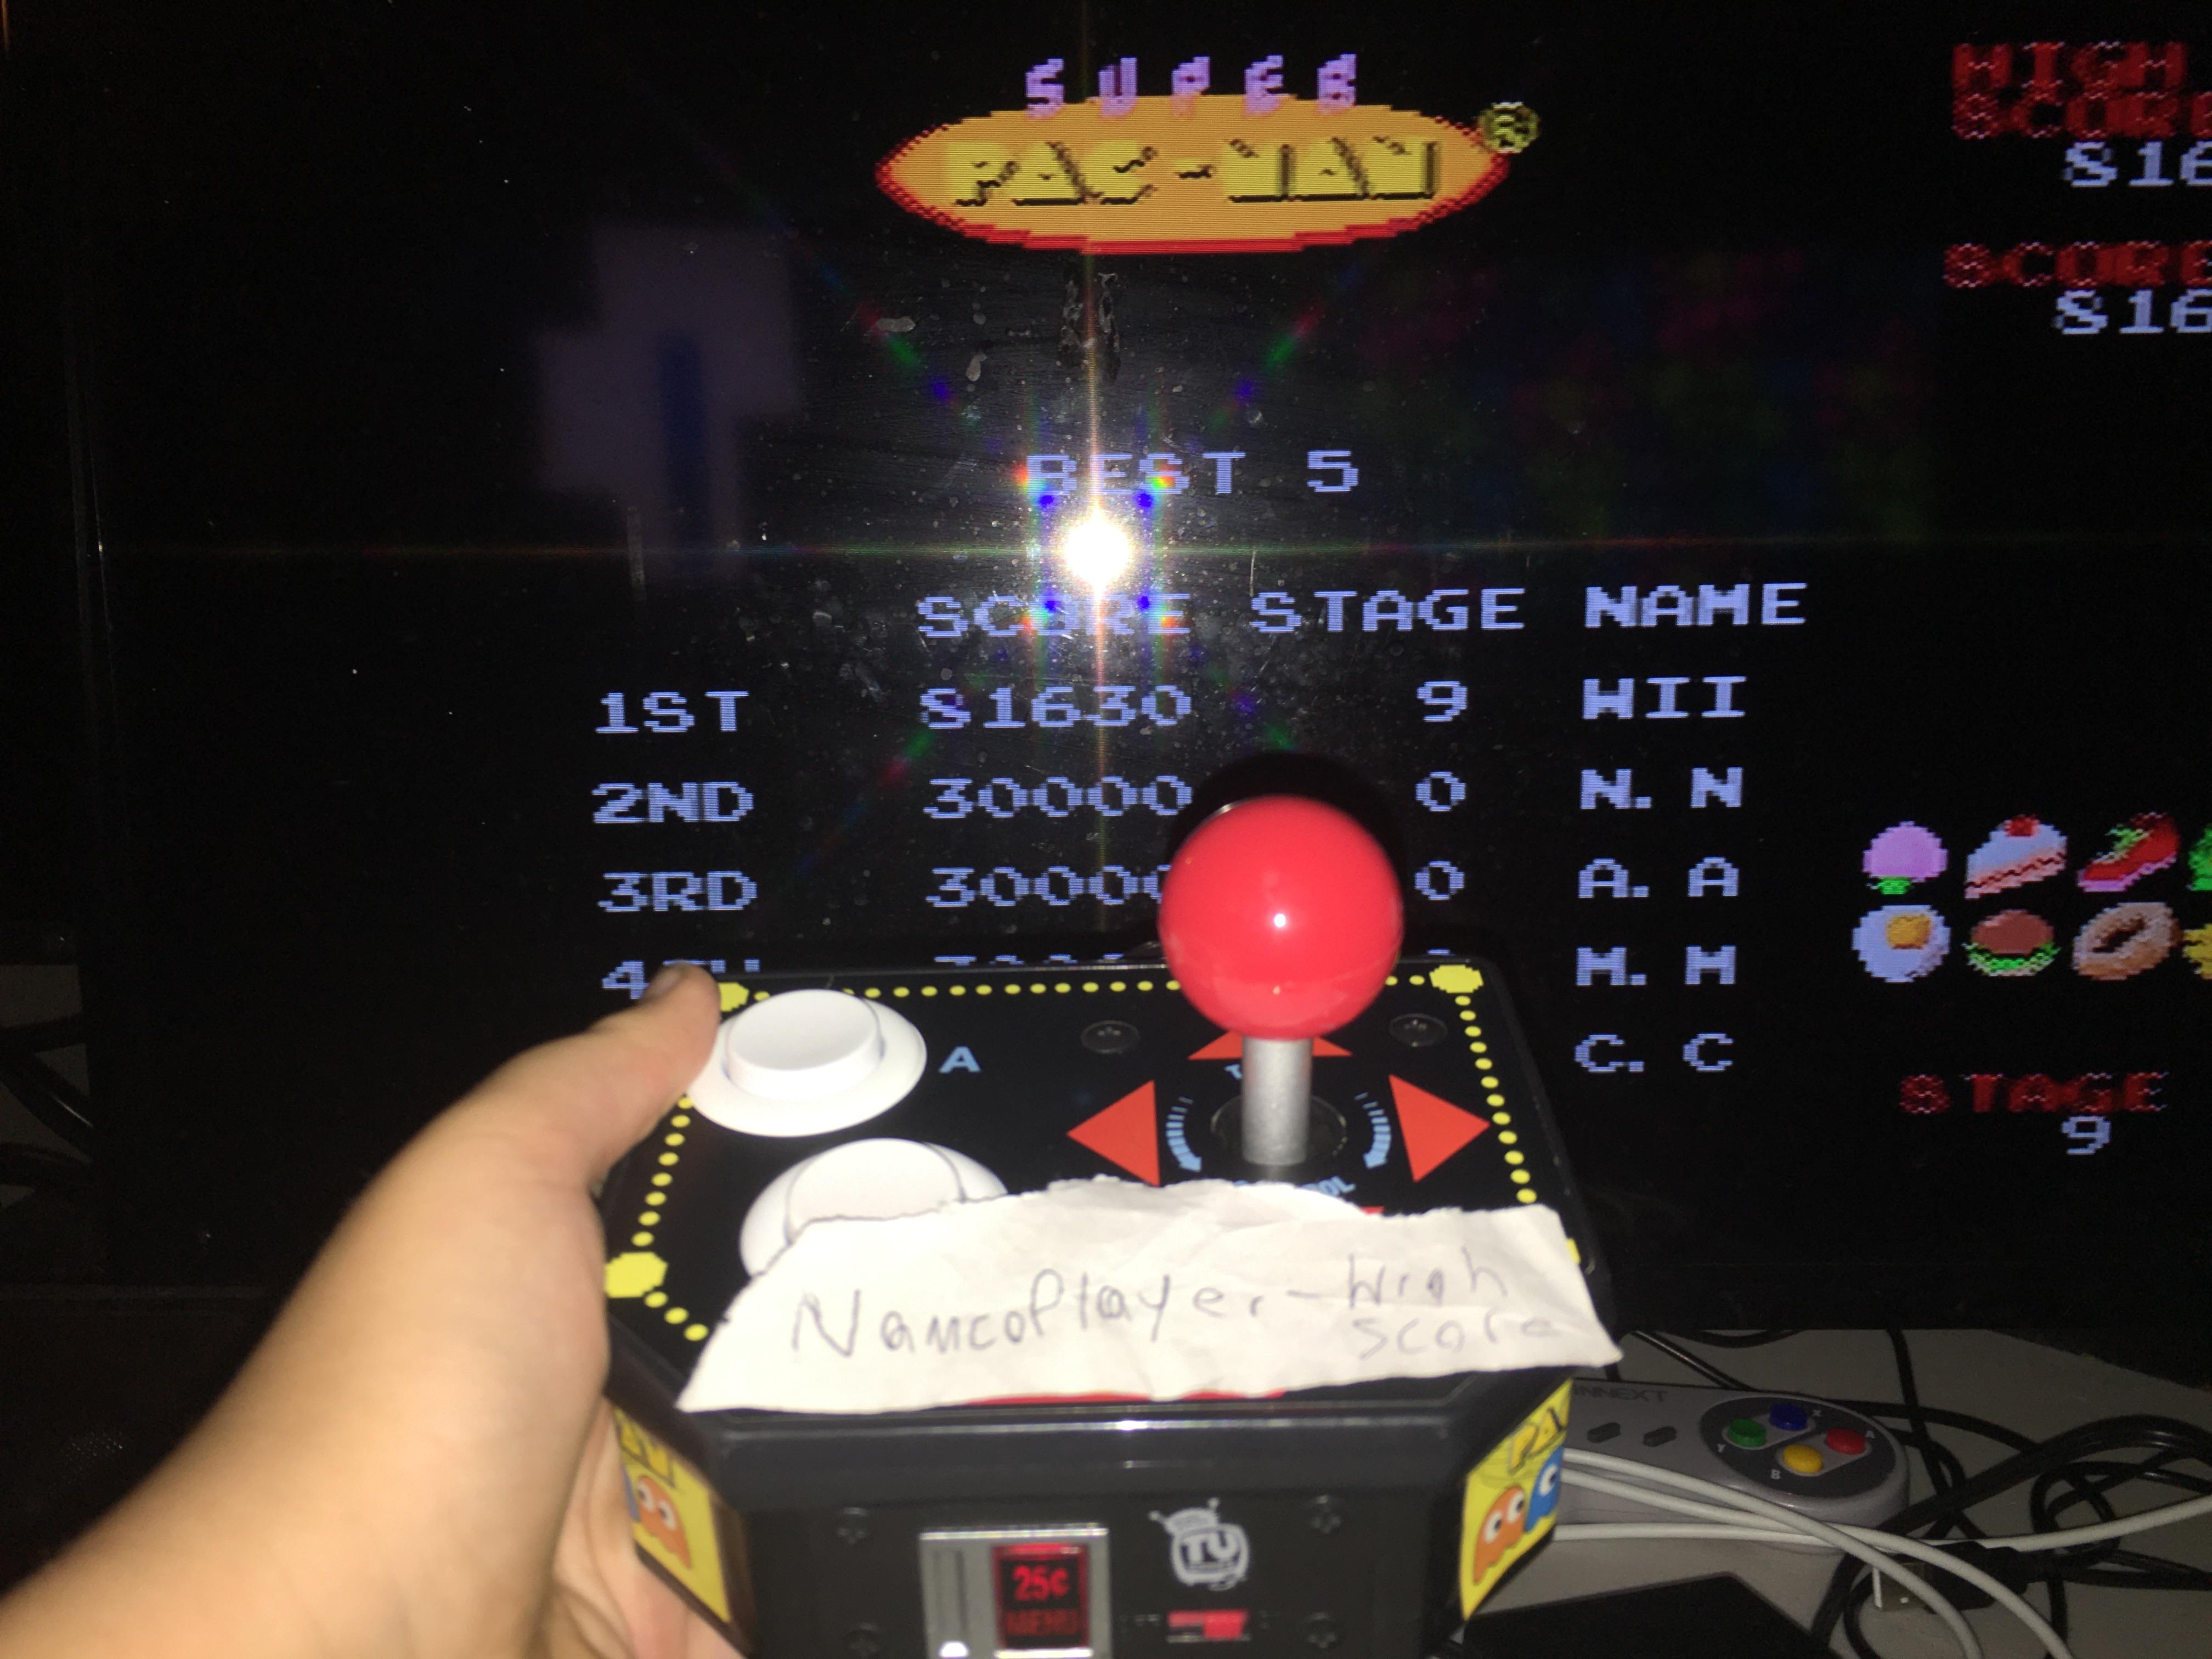 NamcoPlayer: Super Pac-Man (Jakks Pacific Retro Arcade Pac-Man) 81,630 points on 2020-08-25 08:36:32